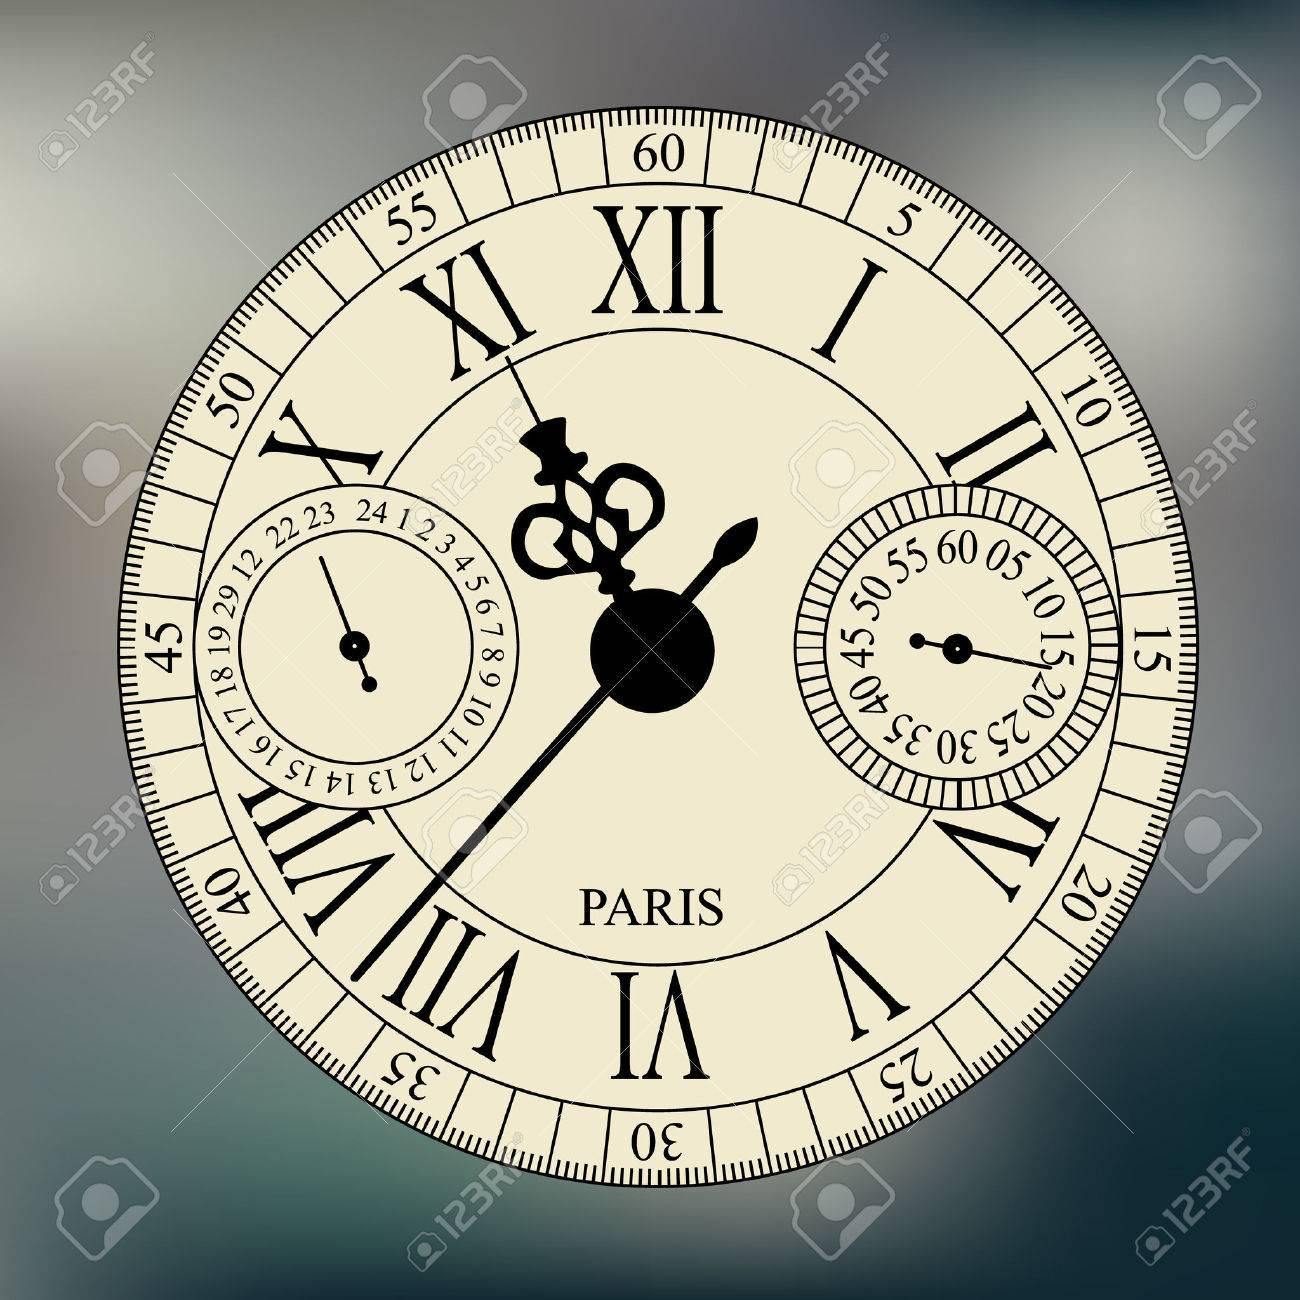 old fashioned antique wrist watch watchface on blurred background - 52872218